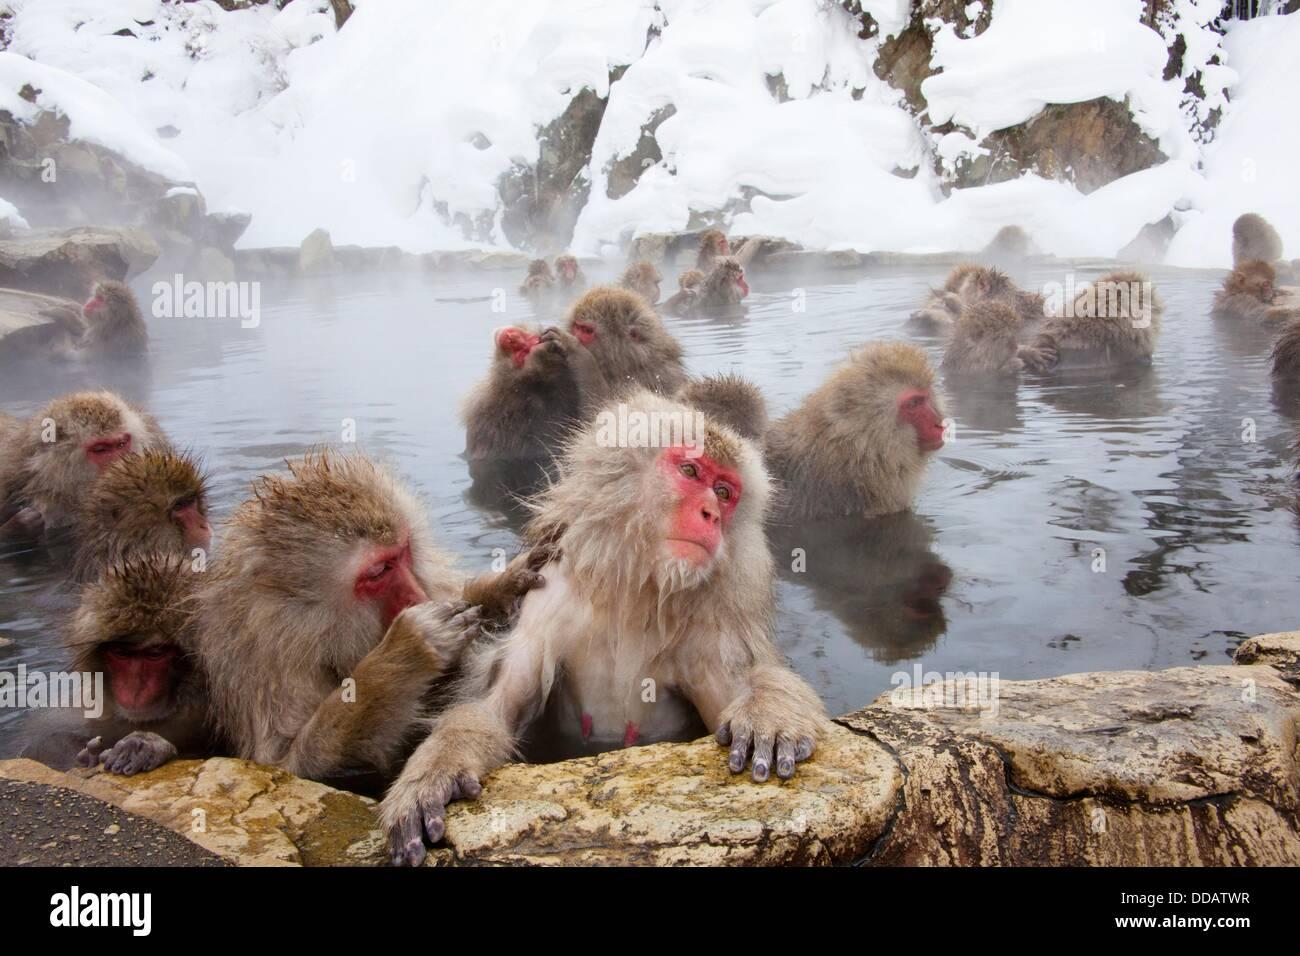 Macachi giapponesi (Macaca fuscata). Jigokudani Monkey Park, Prefettura di Nagano, Giappone Immagini Stock